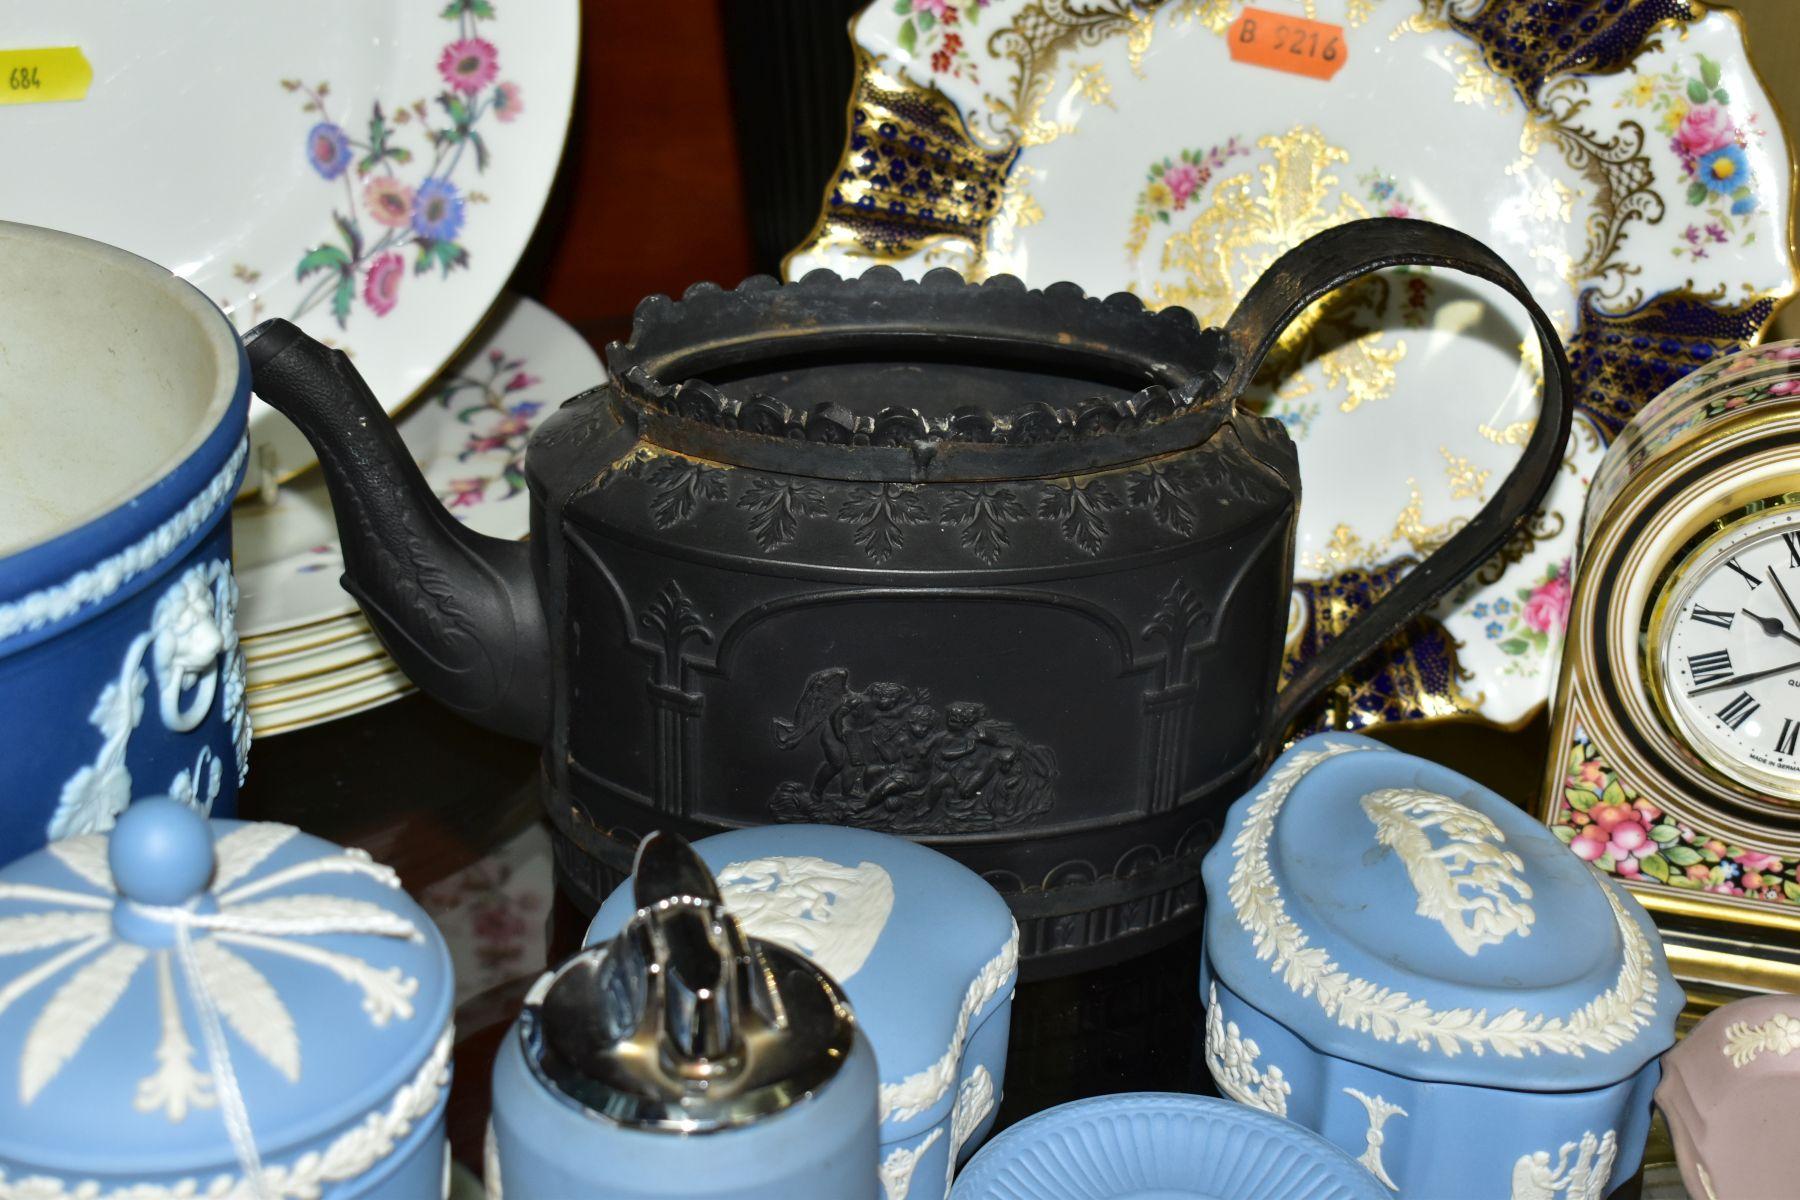 CERAMICS to include blue jasper ware trinkets, etc, Wedgwood Clio clock, black basalt teapot with - Image 3 of 8